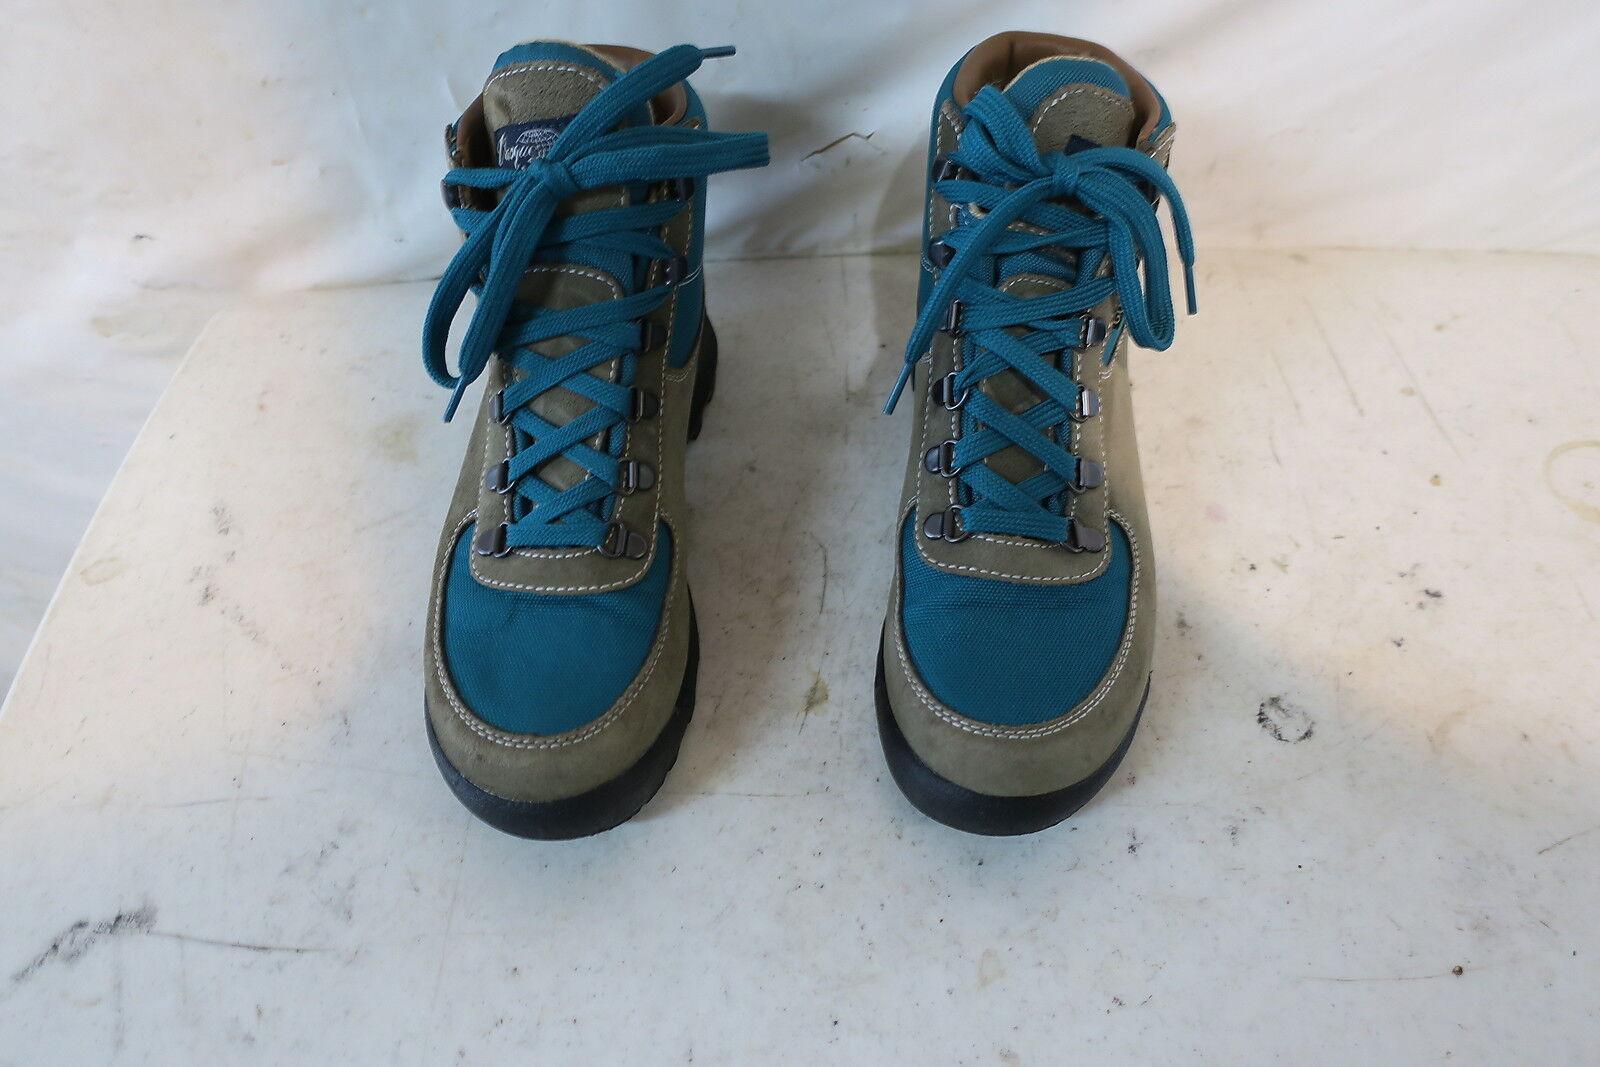 Vasque GTX Hiking Boot   Womenu0027s 41.5 US 10.0 Sage Everglade Retail 200  Skywalk Nnnidq2518 Womenu0027s